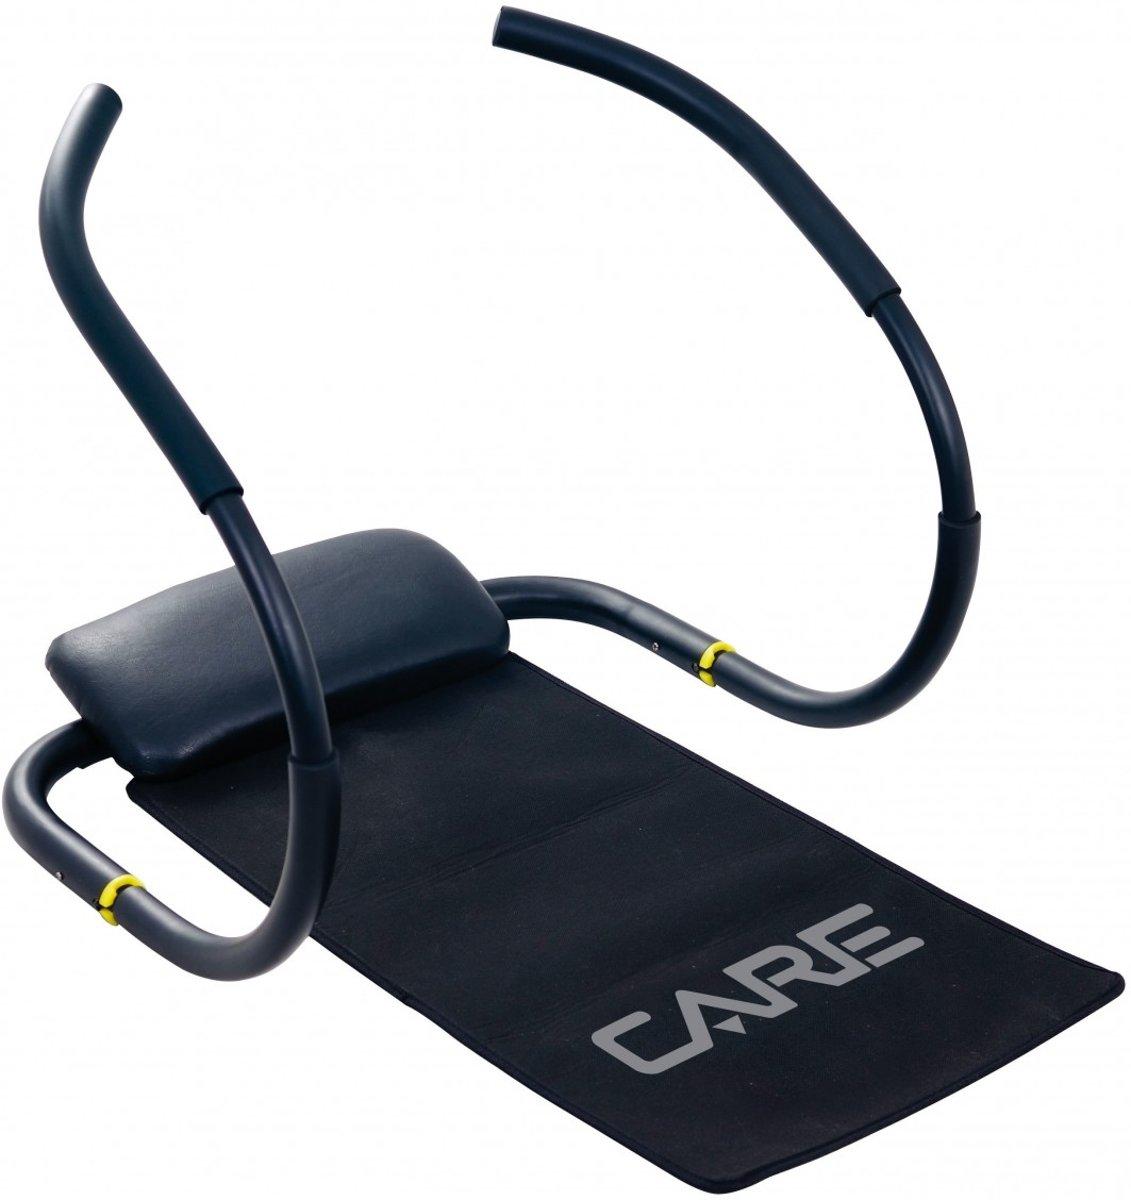 Care Fitness - Abdo former pro - Buikspier trainer - Ab former